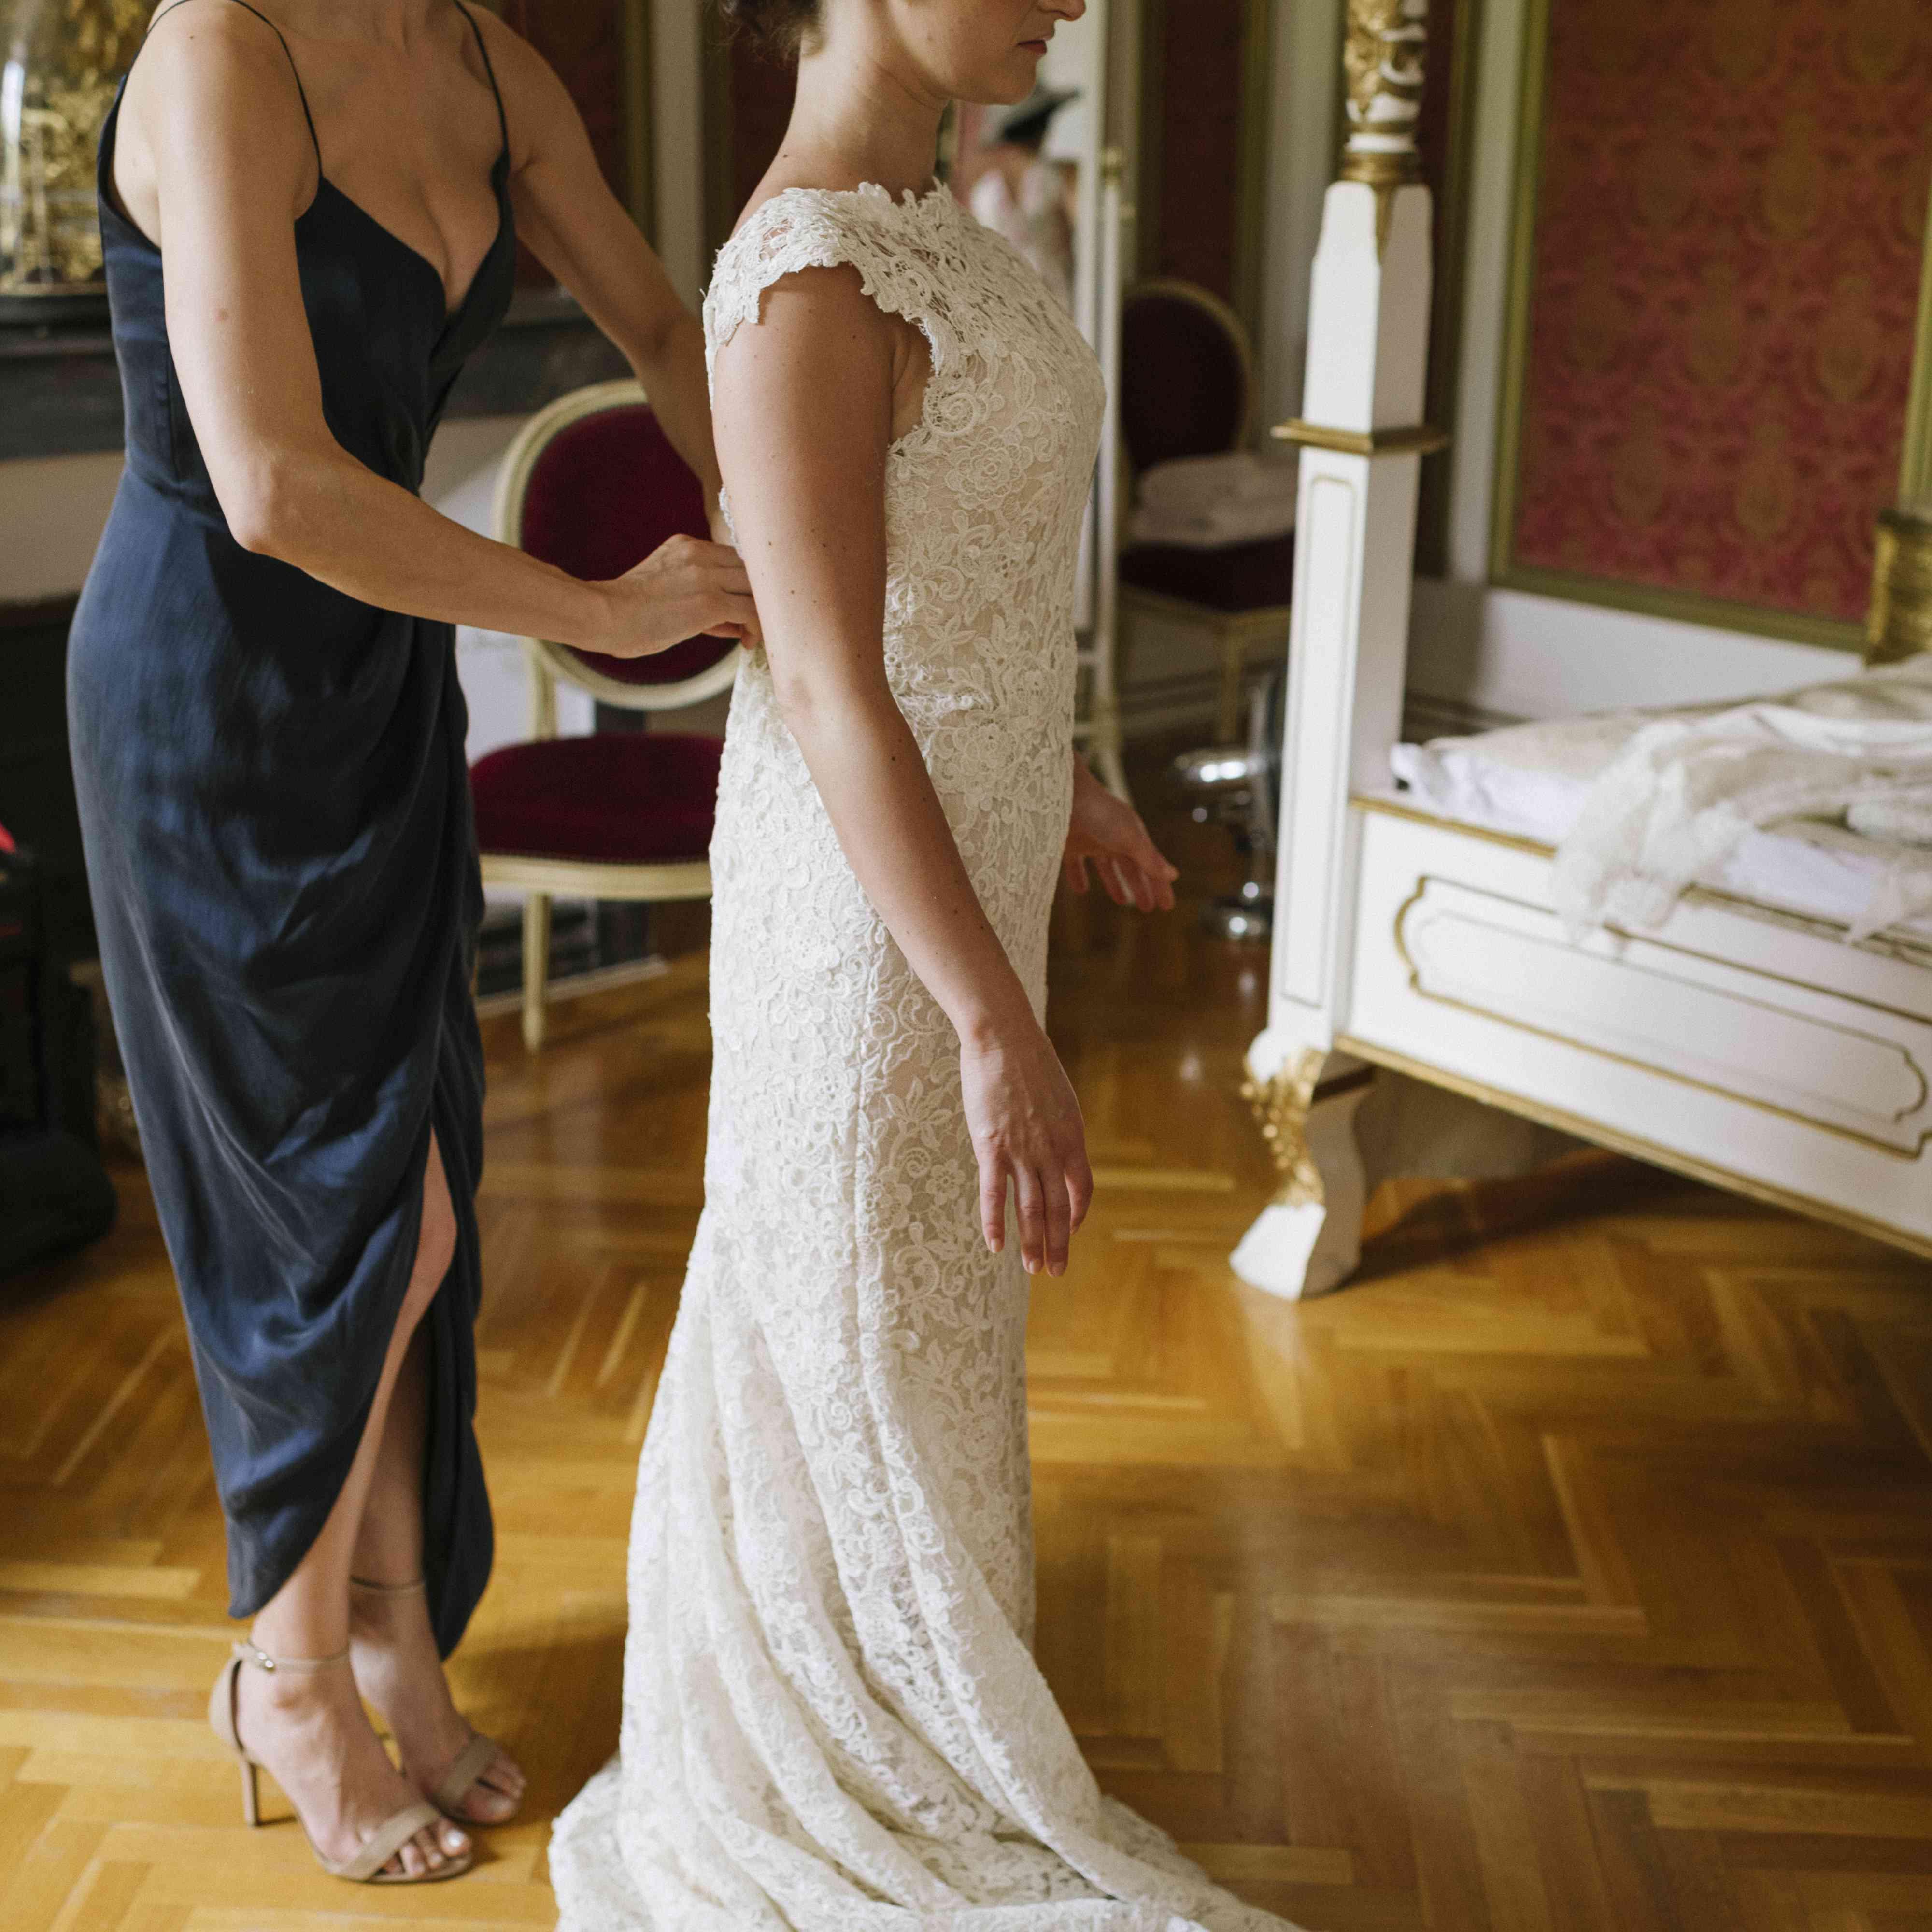 <p>bride getting ready with bridesmaid</p><br><br>